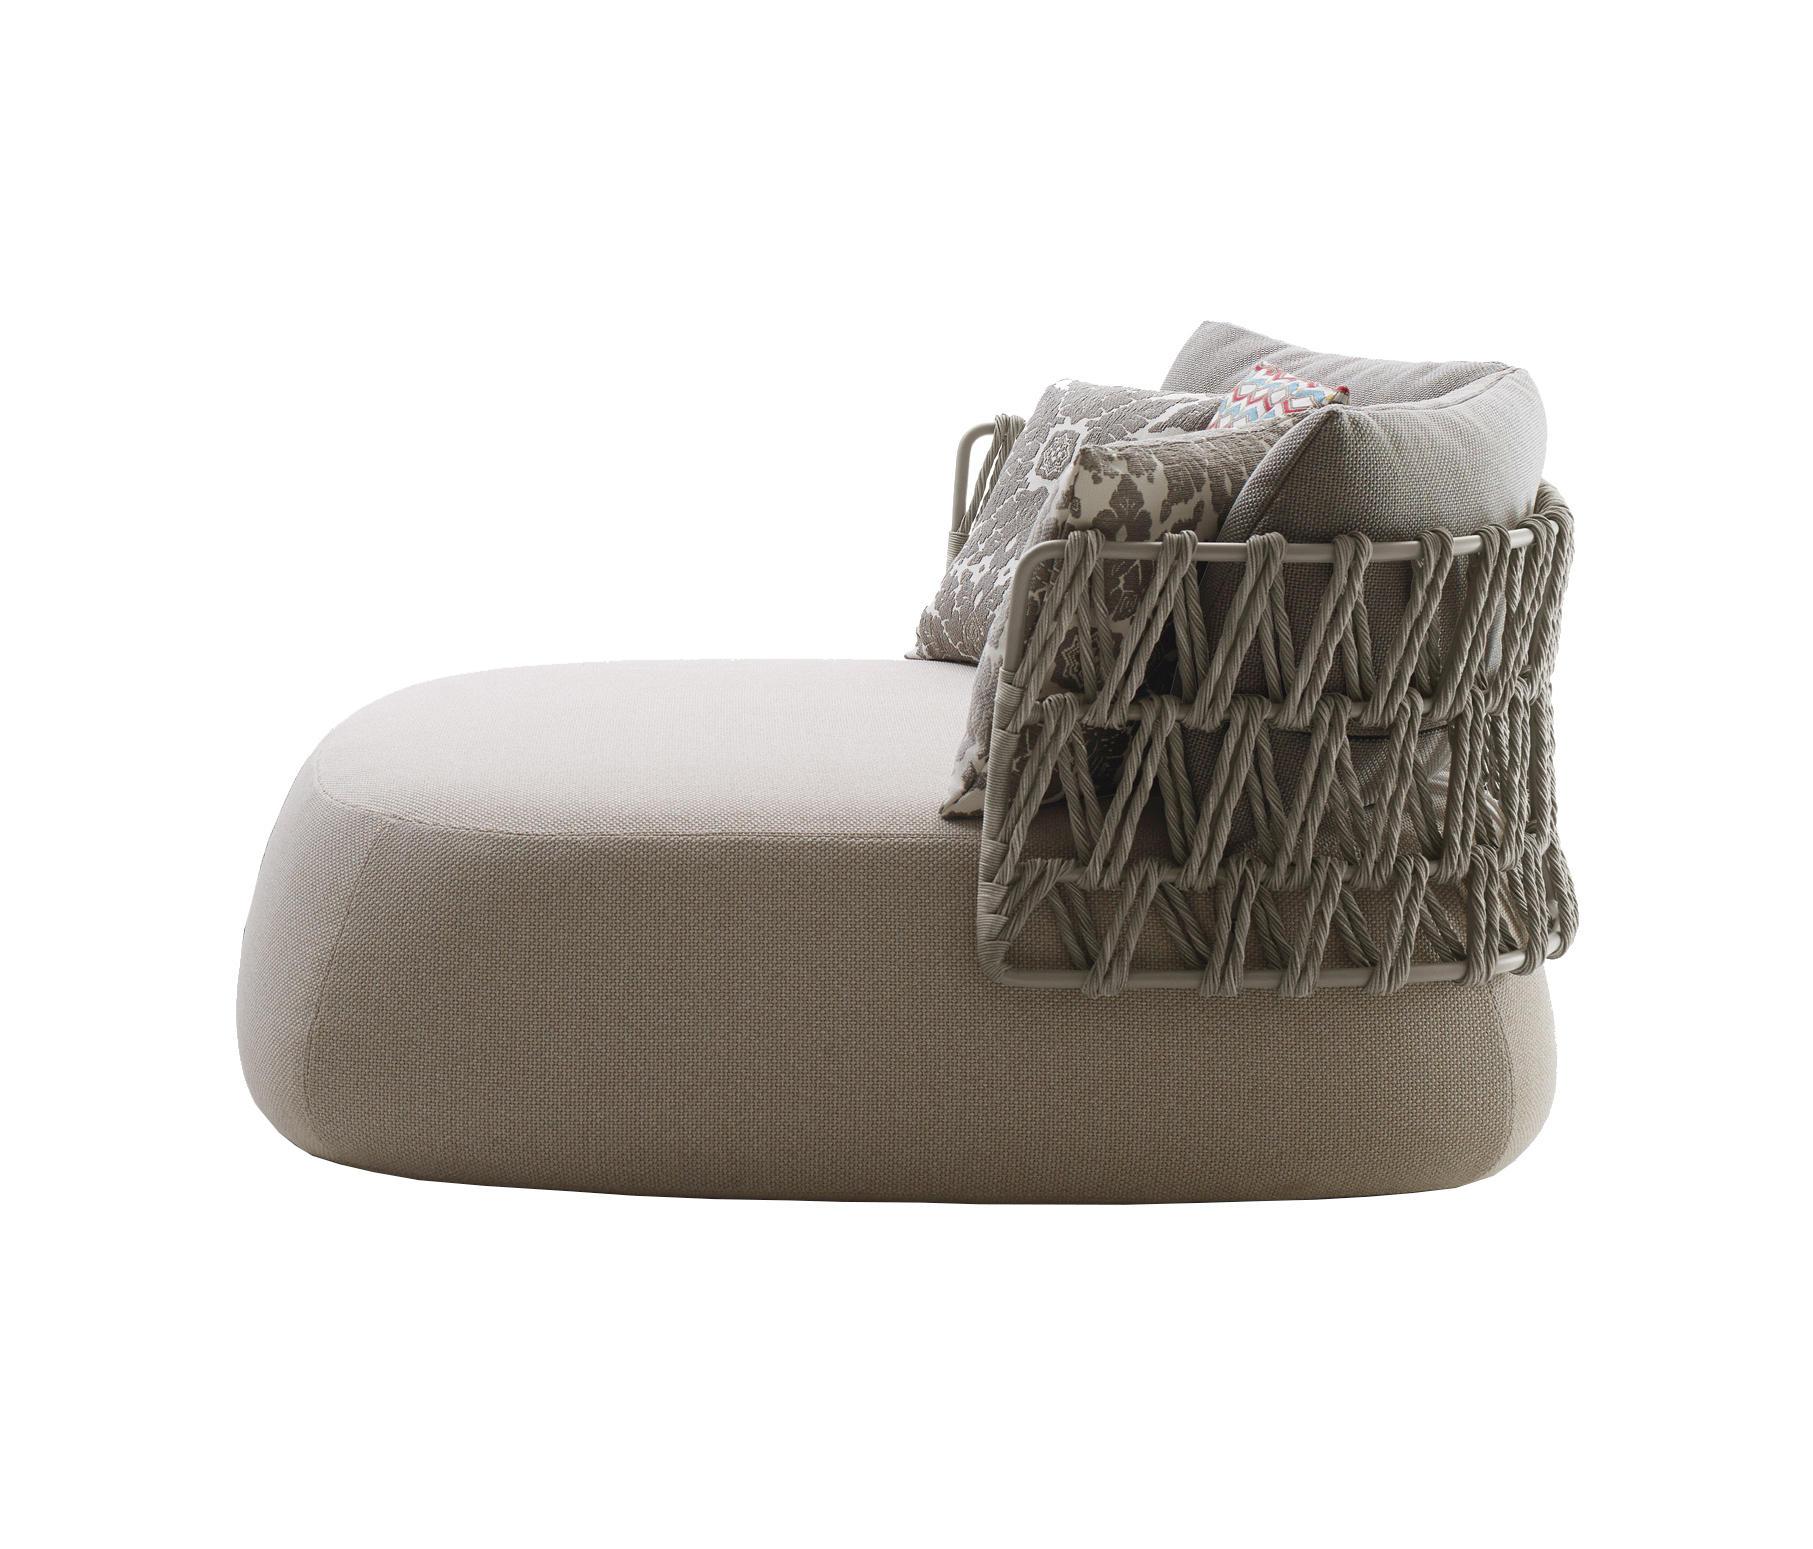 Fat sofa outdoor sofas from b b italia architonic for B b furniture